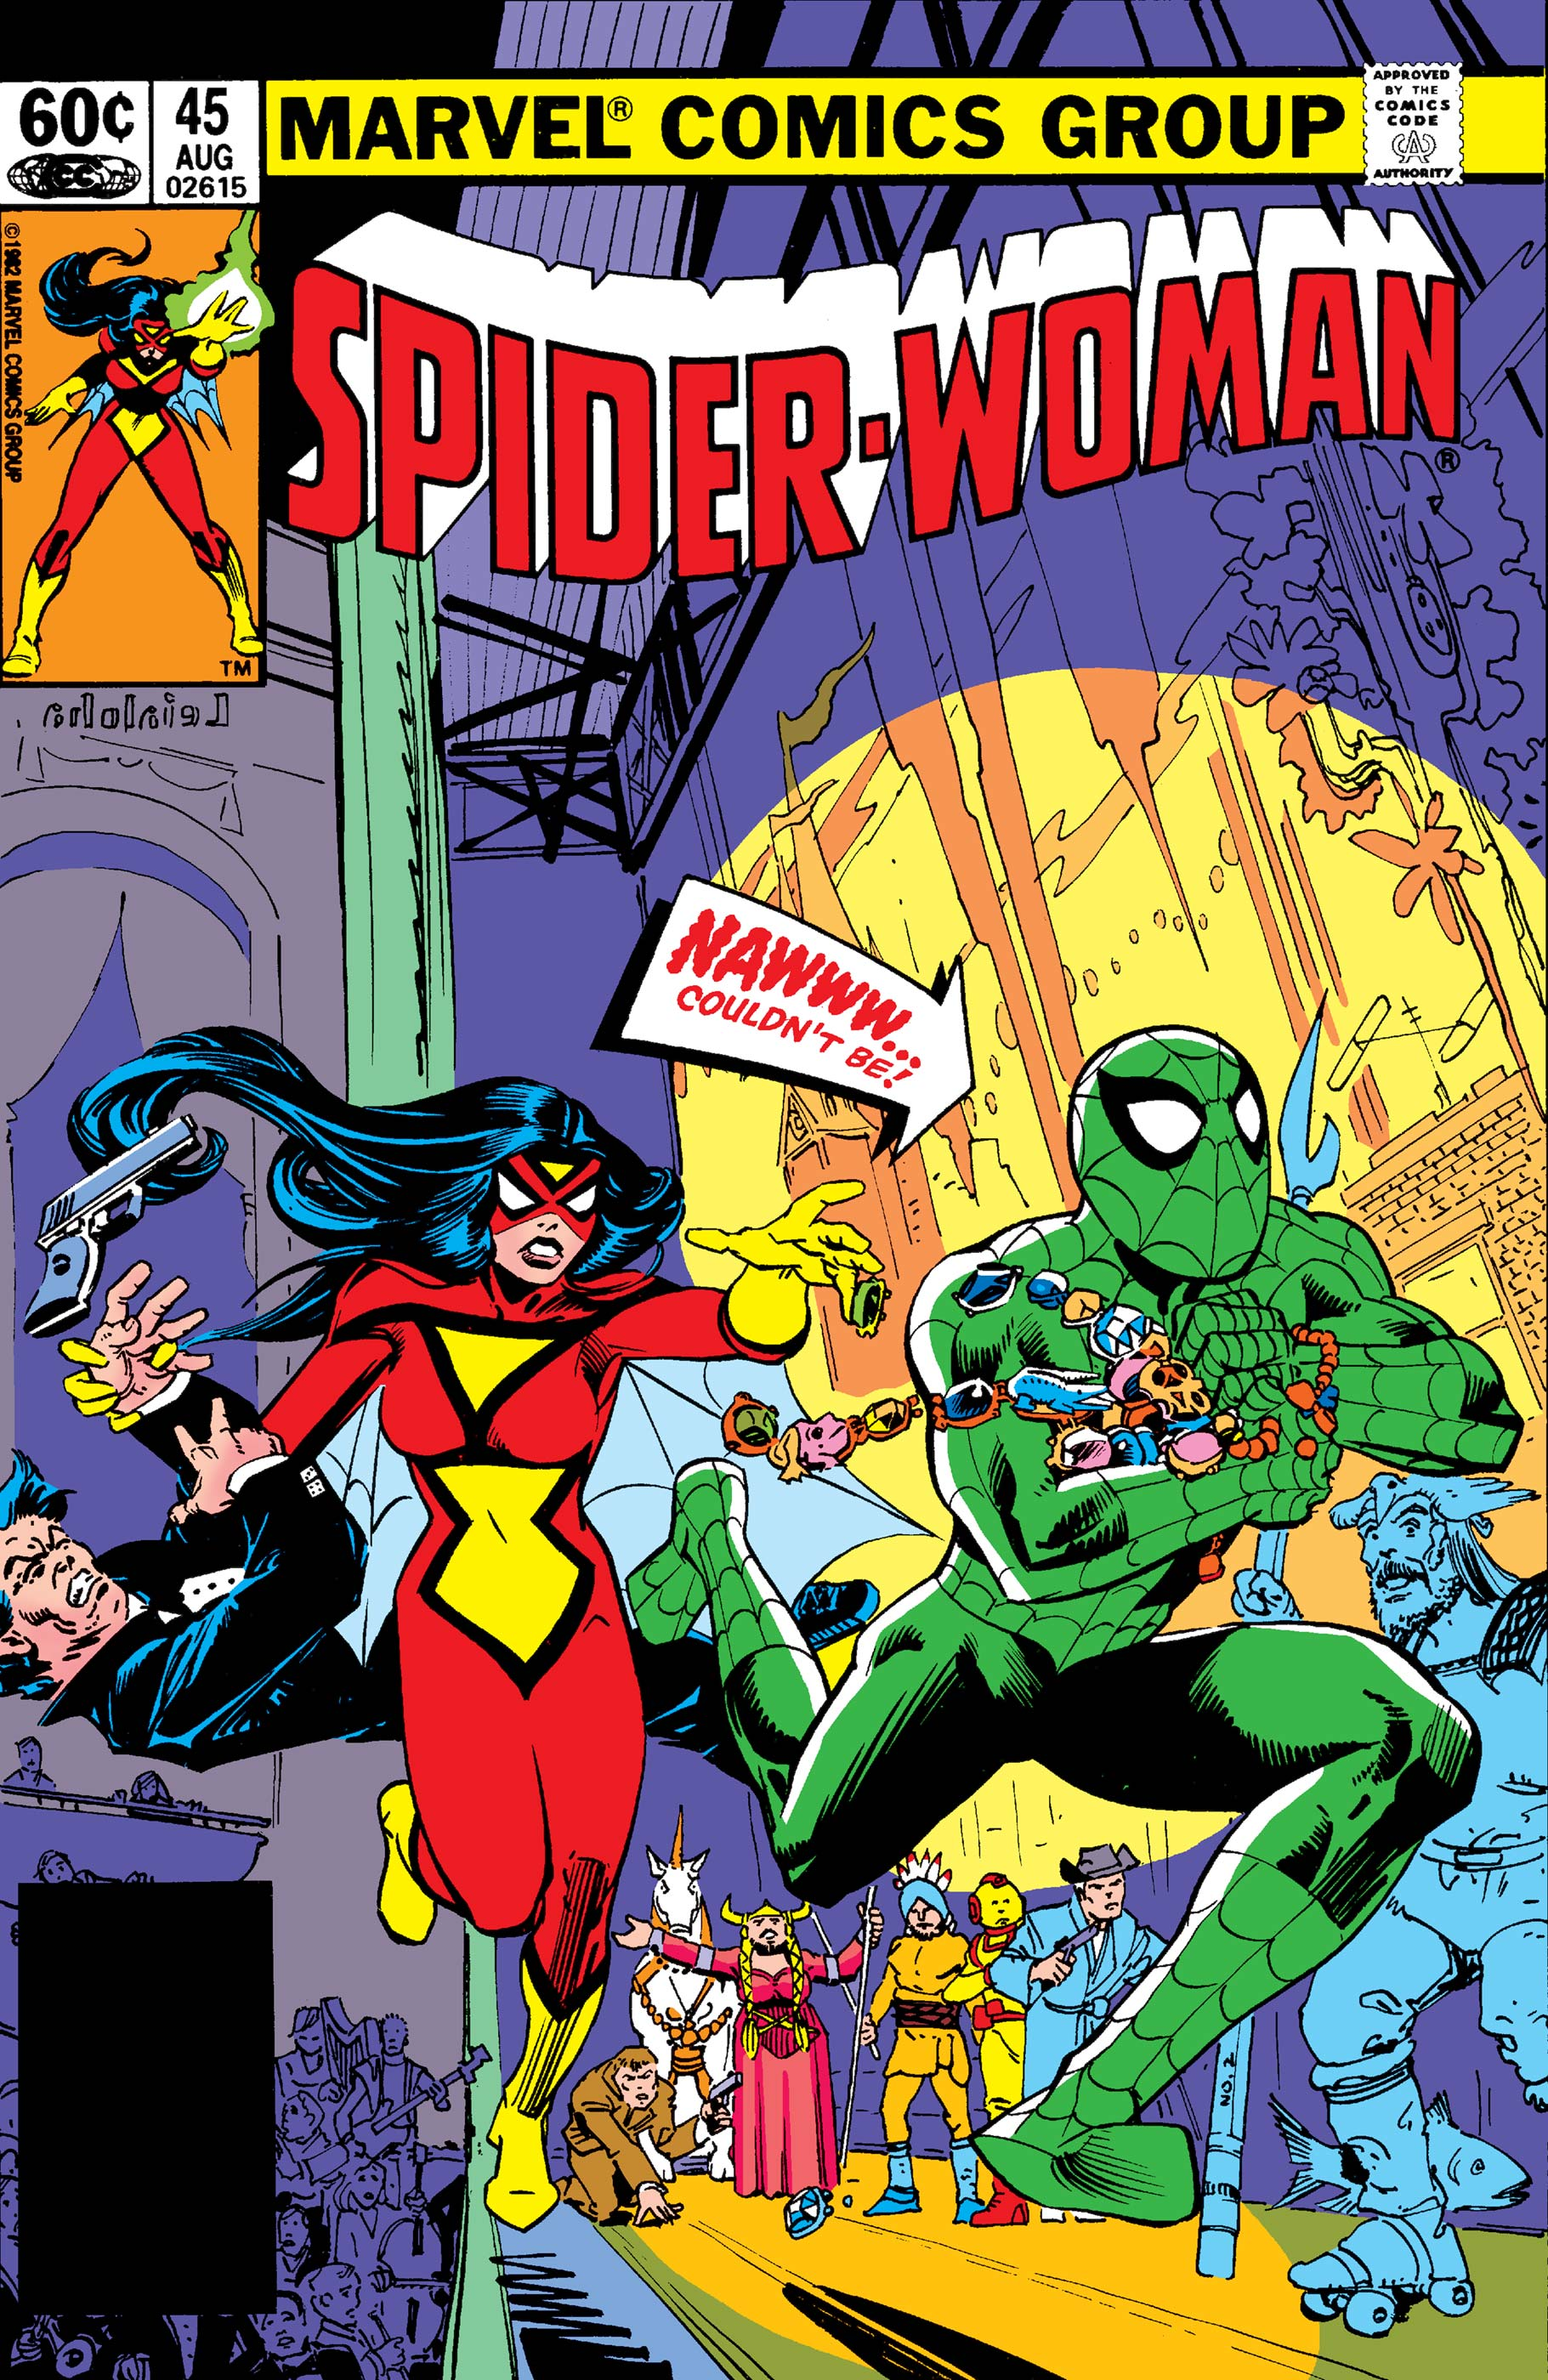 Spider-Woman (1978) #45